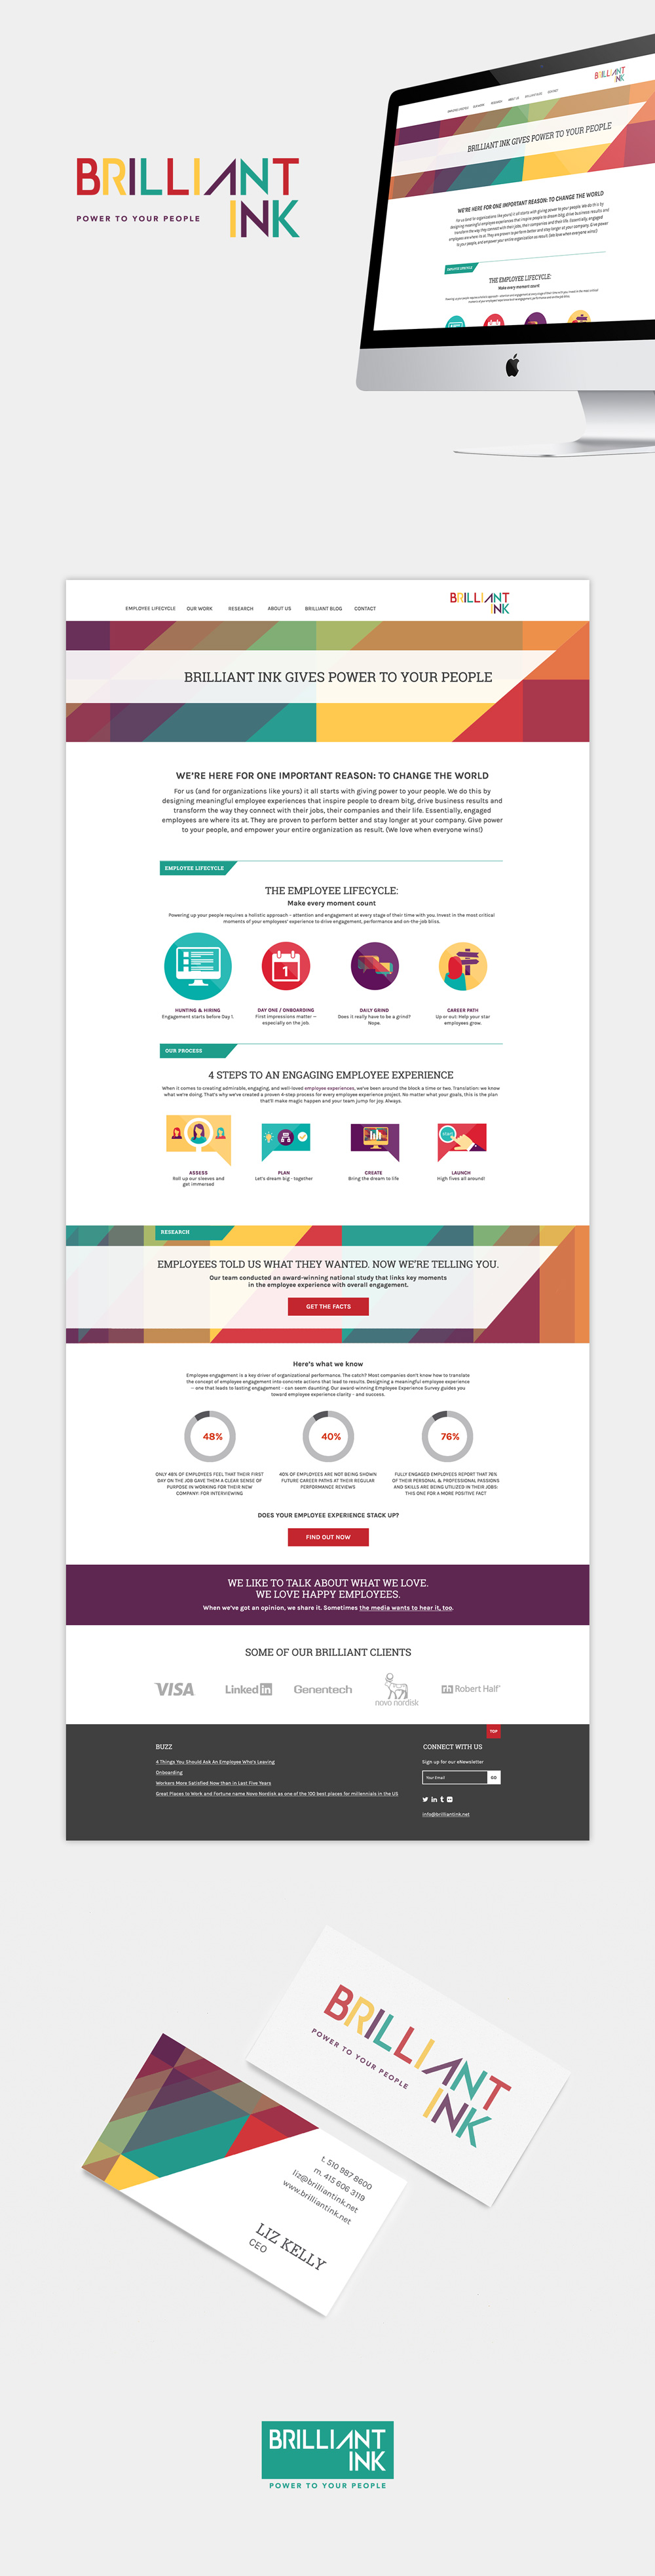 Branding and web design by jennifer-miranda.com